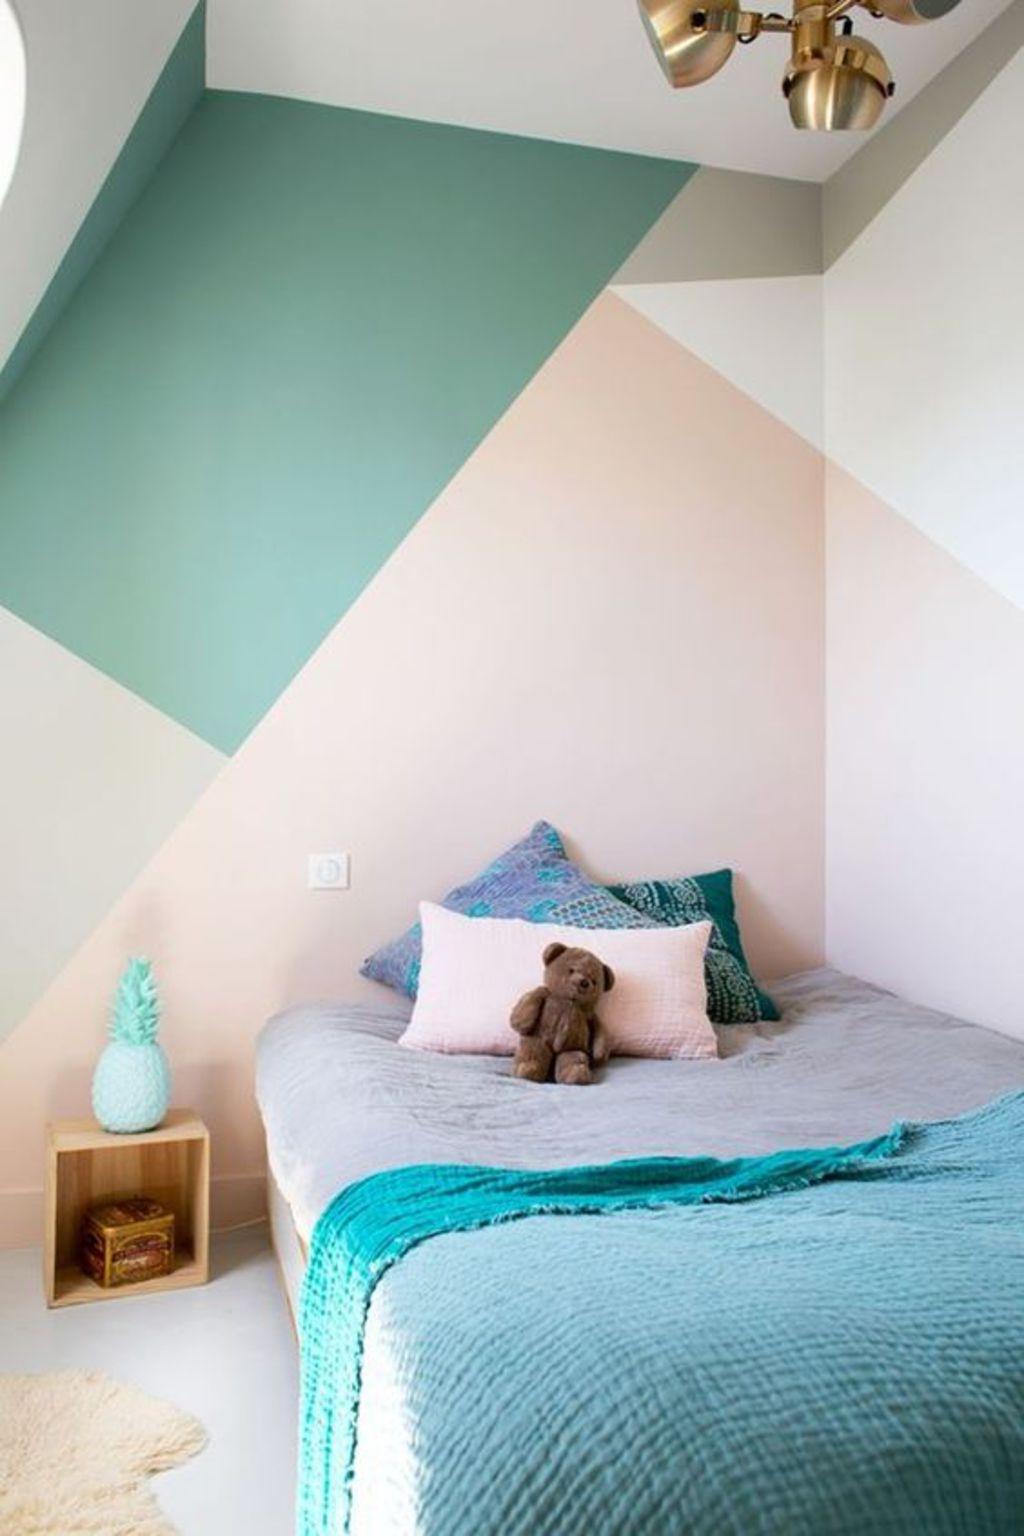 geometrische-vormen-muur-slaapkamer